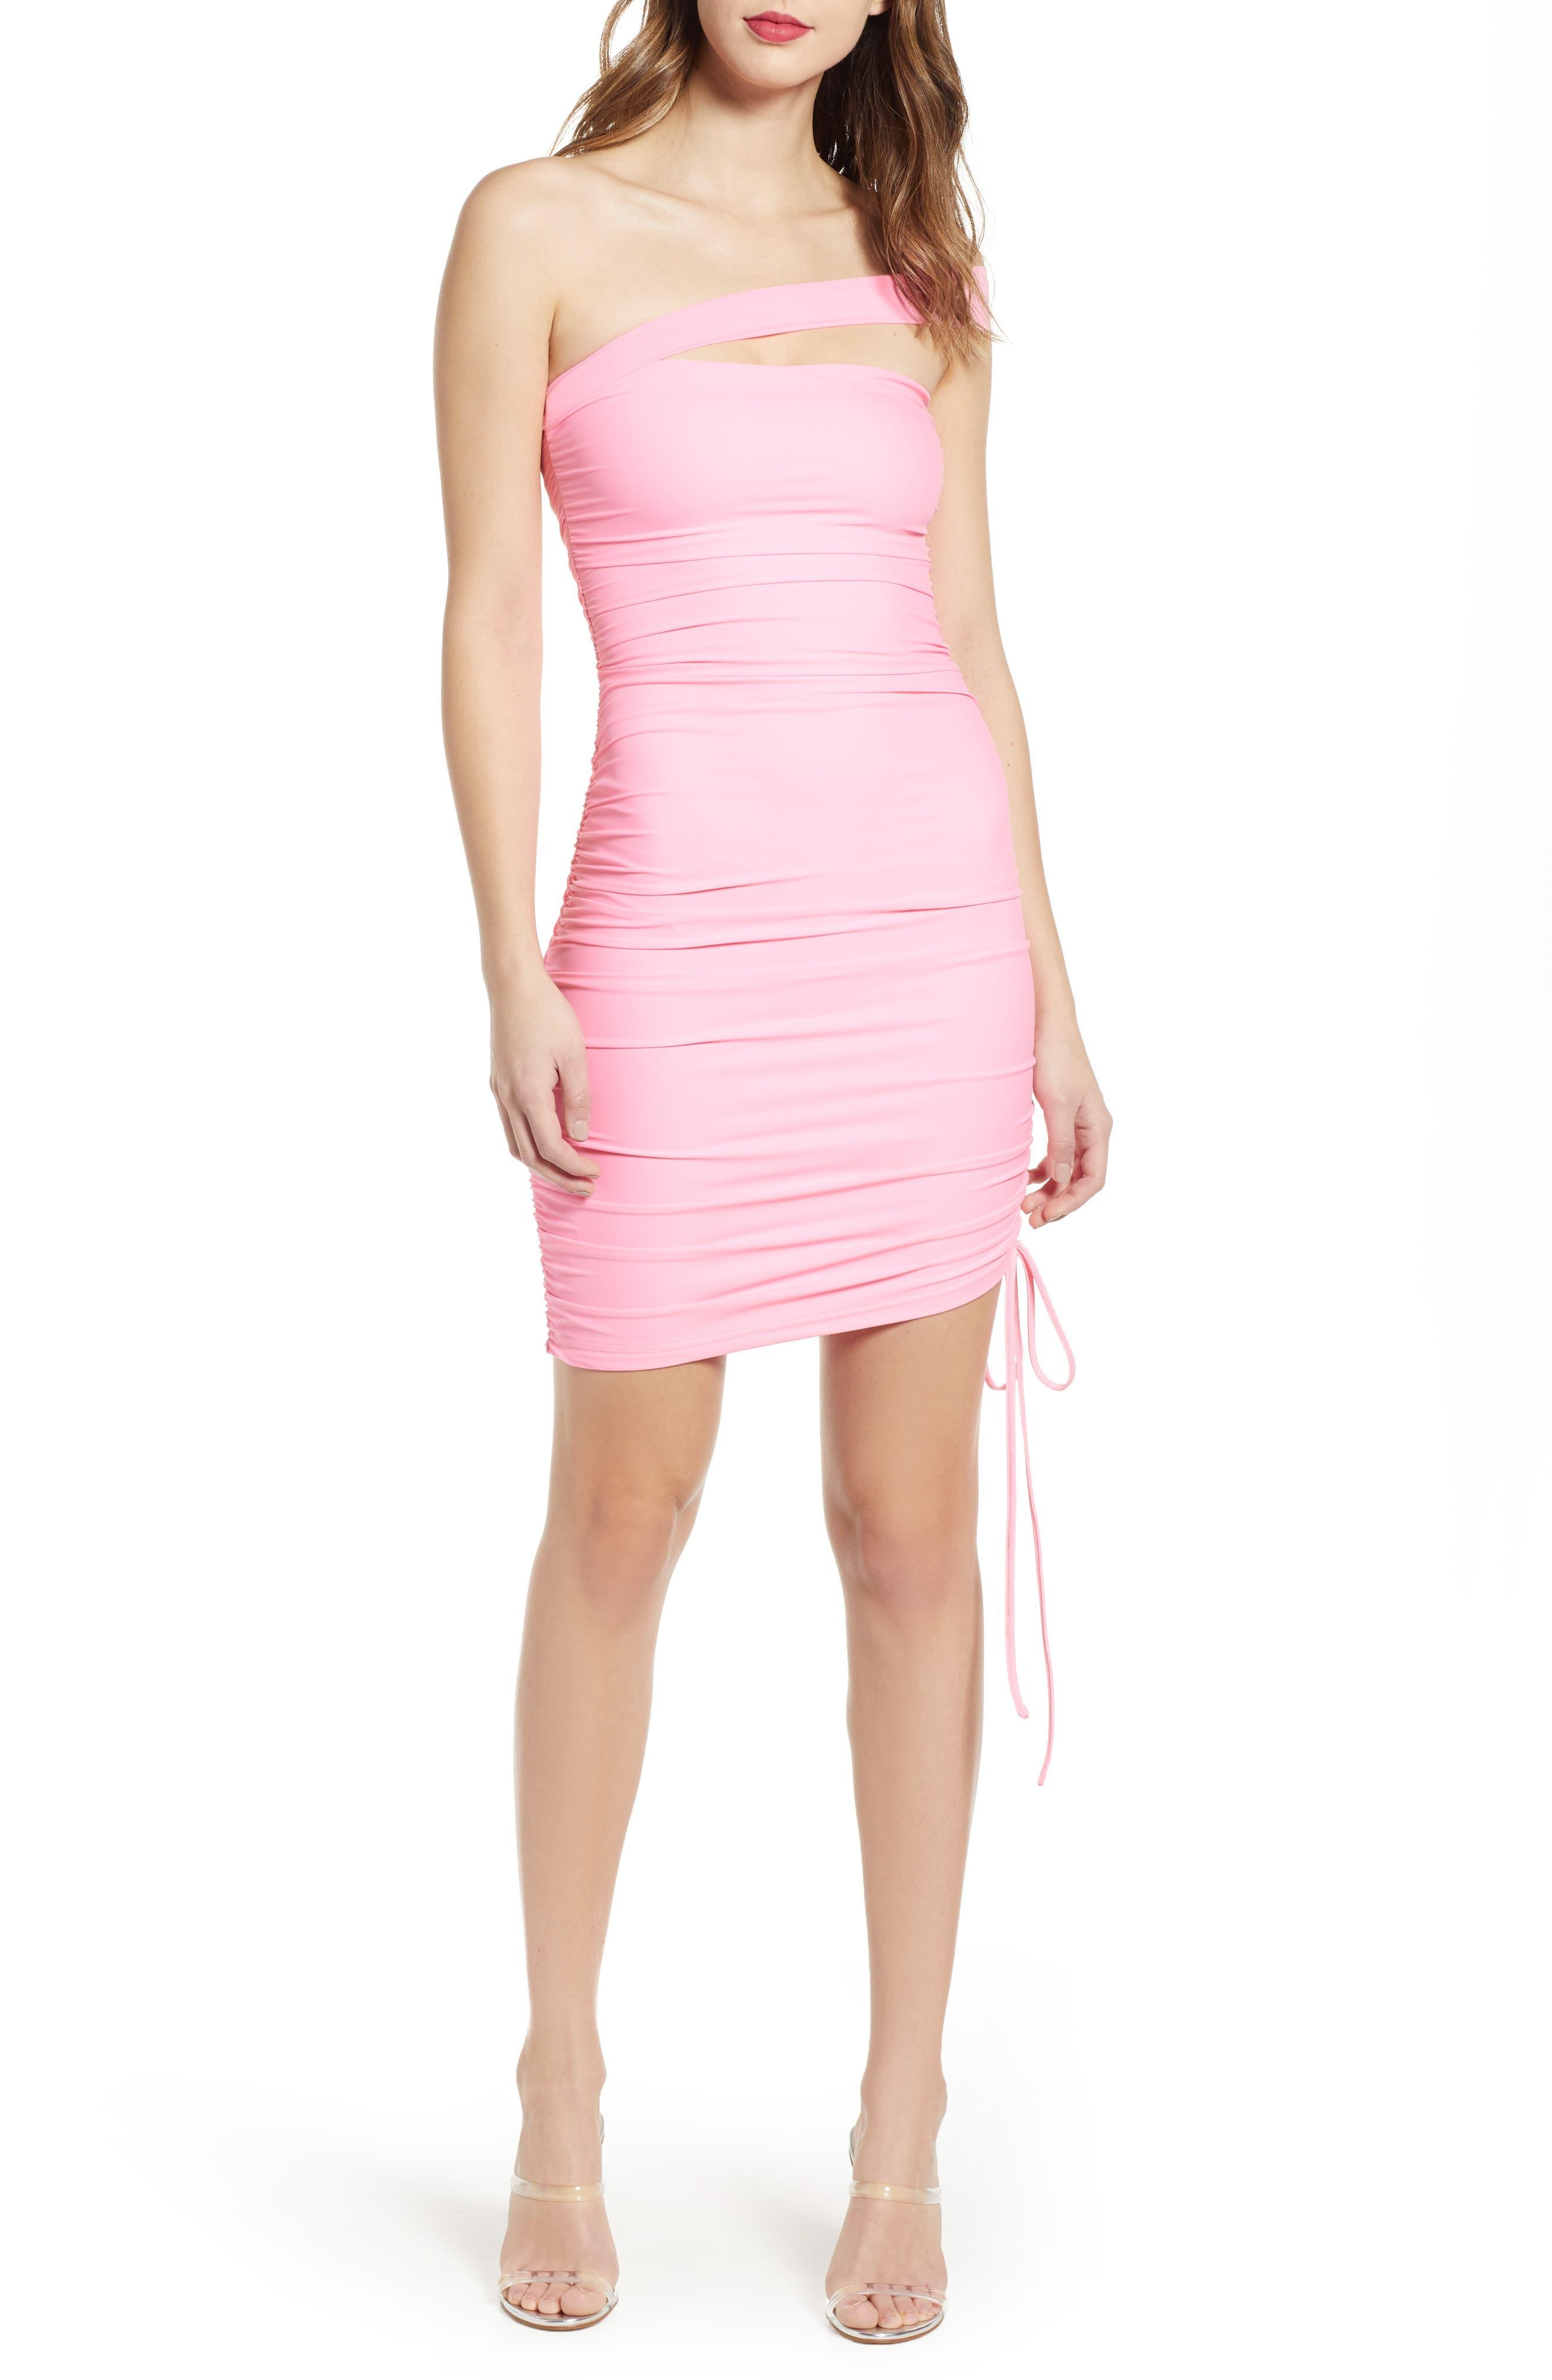 Tiger Mist Ciera Off The Shoulder Body-Con Dress, Pink